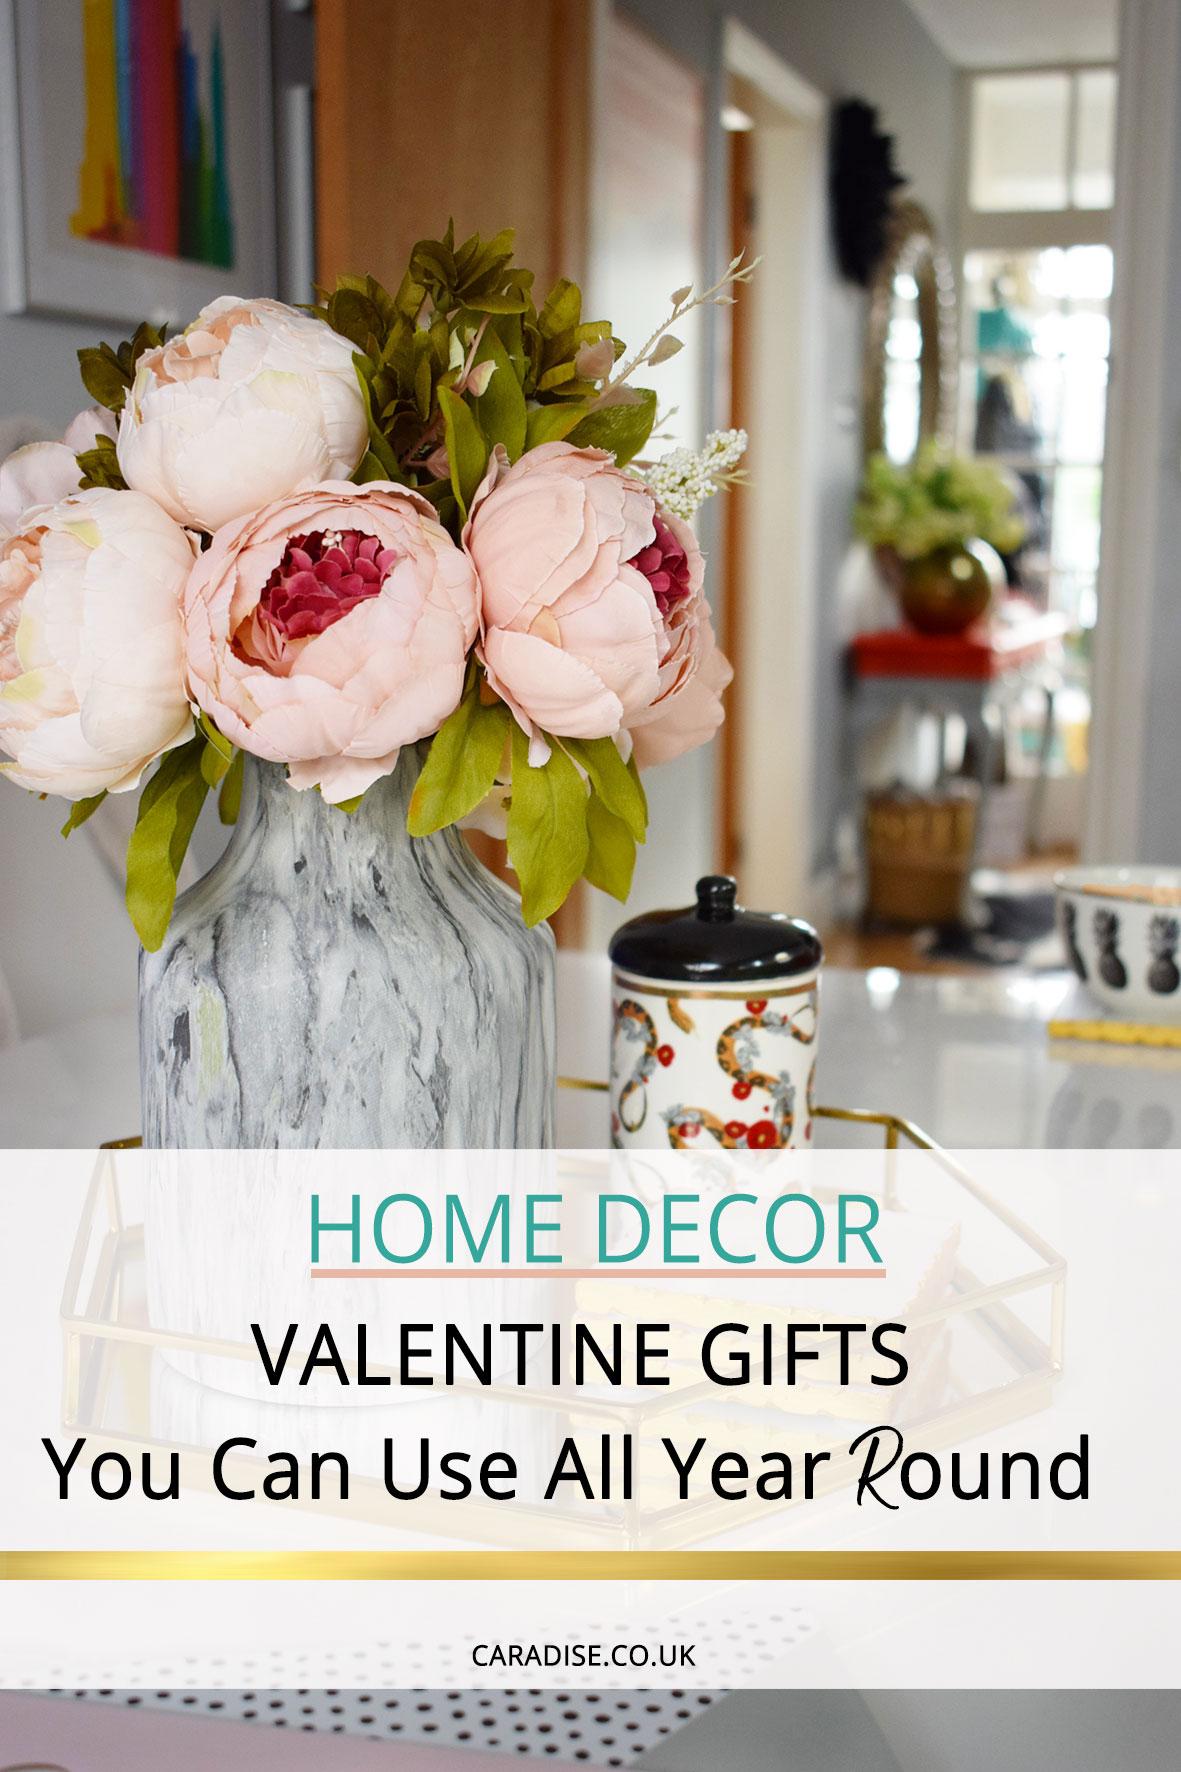 Home Decor Gifts Cheap Home Decor Online Cheap Home Decor Home